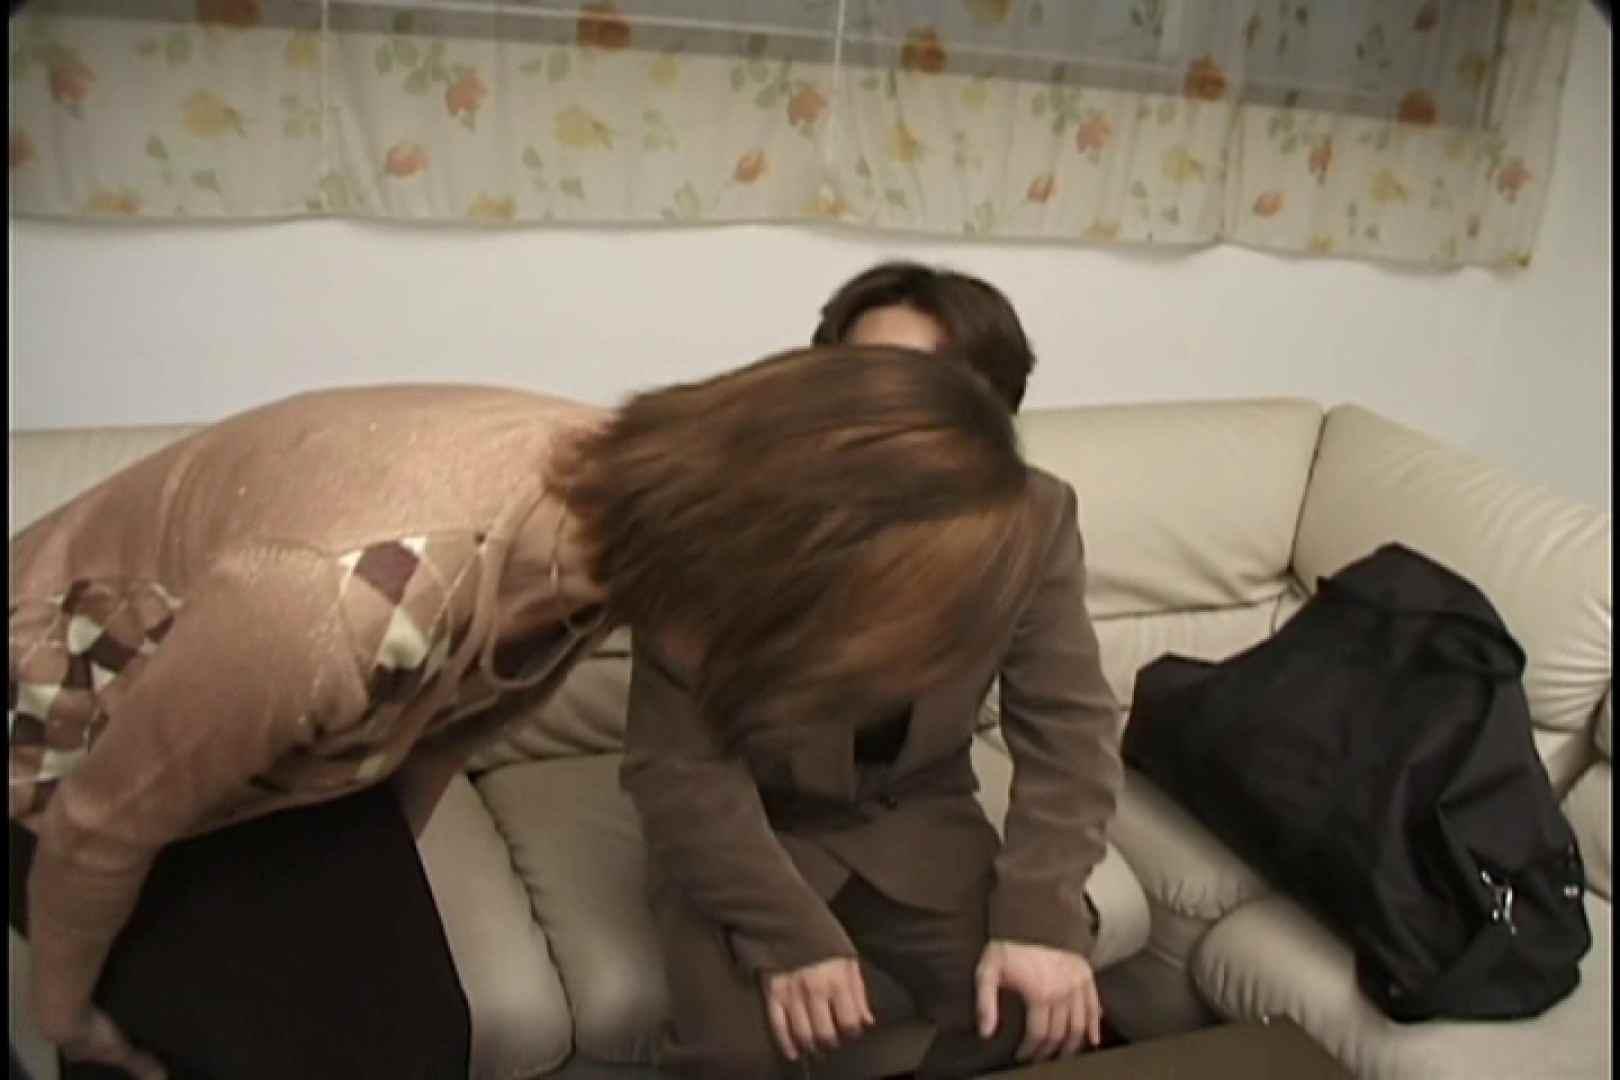 昼間の奥様は欲求不満 ~石川麻紀~ 熟女  69枚 6